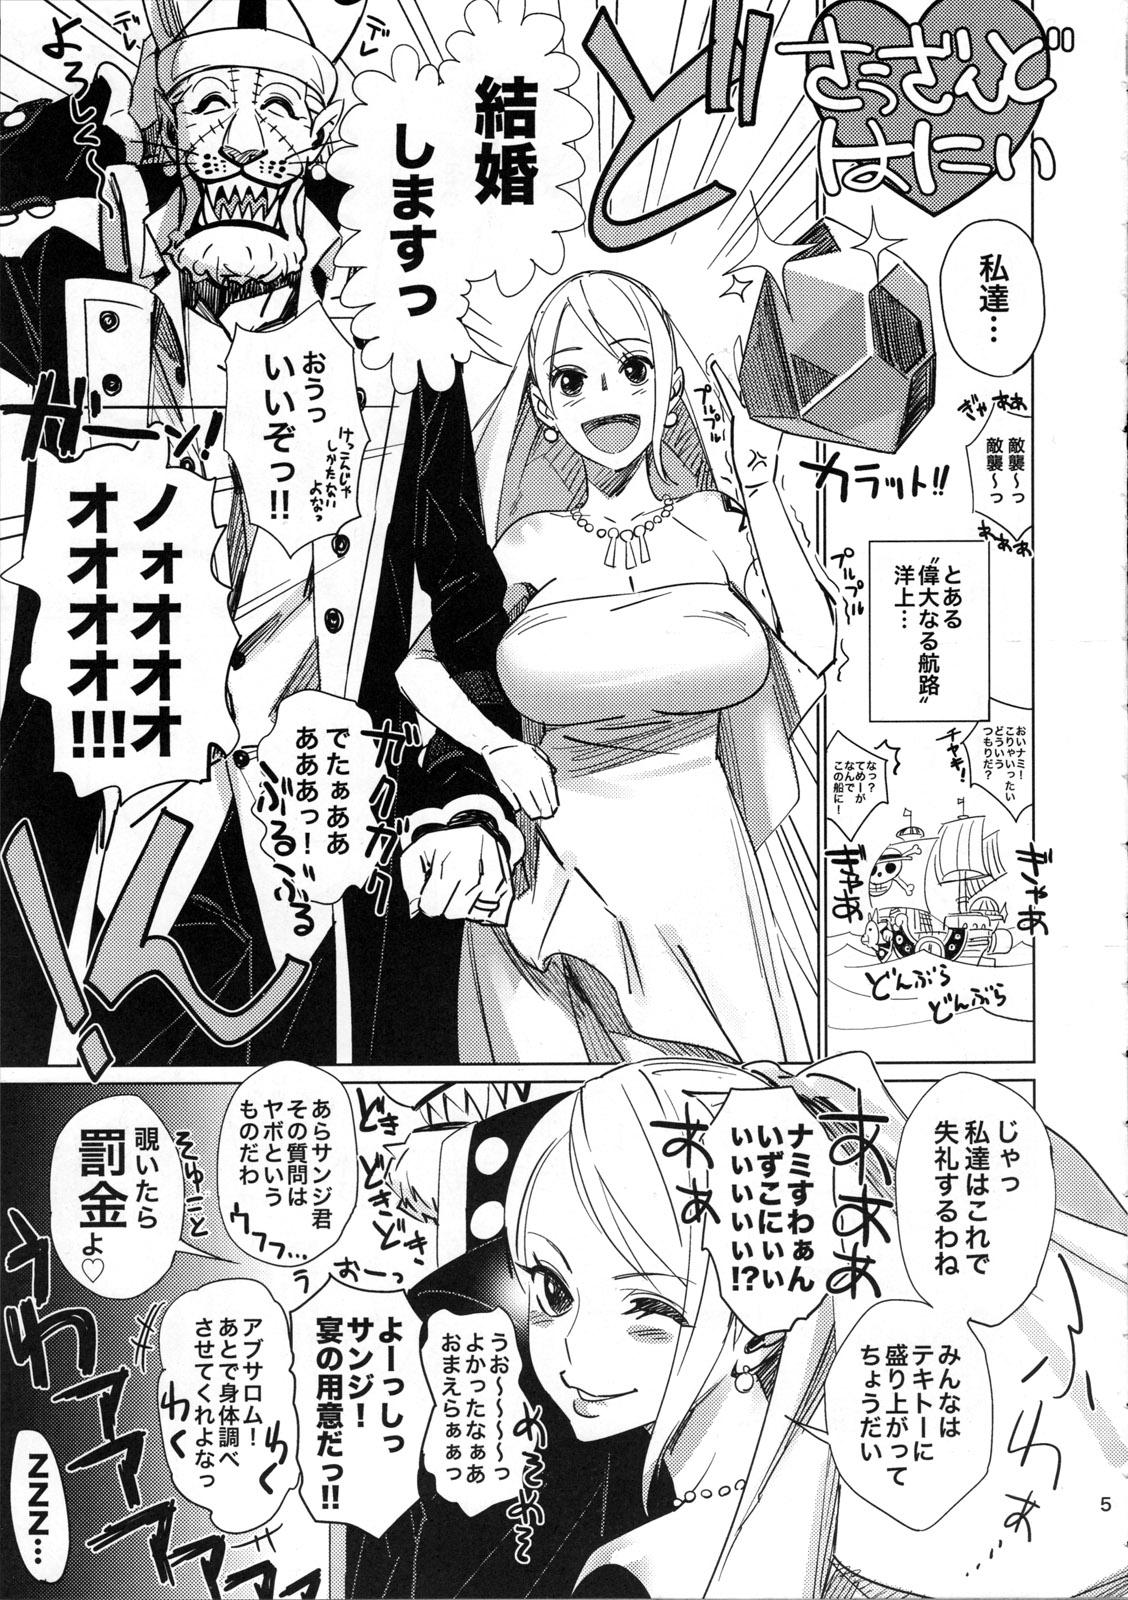 Shinsekai 4